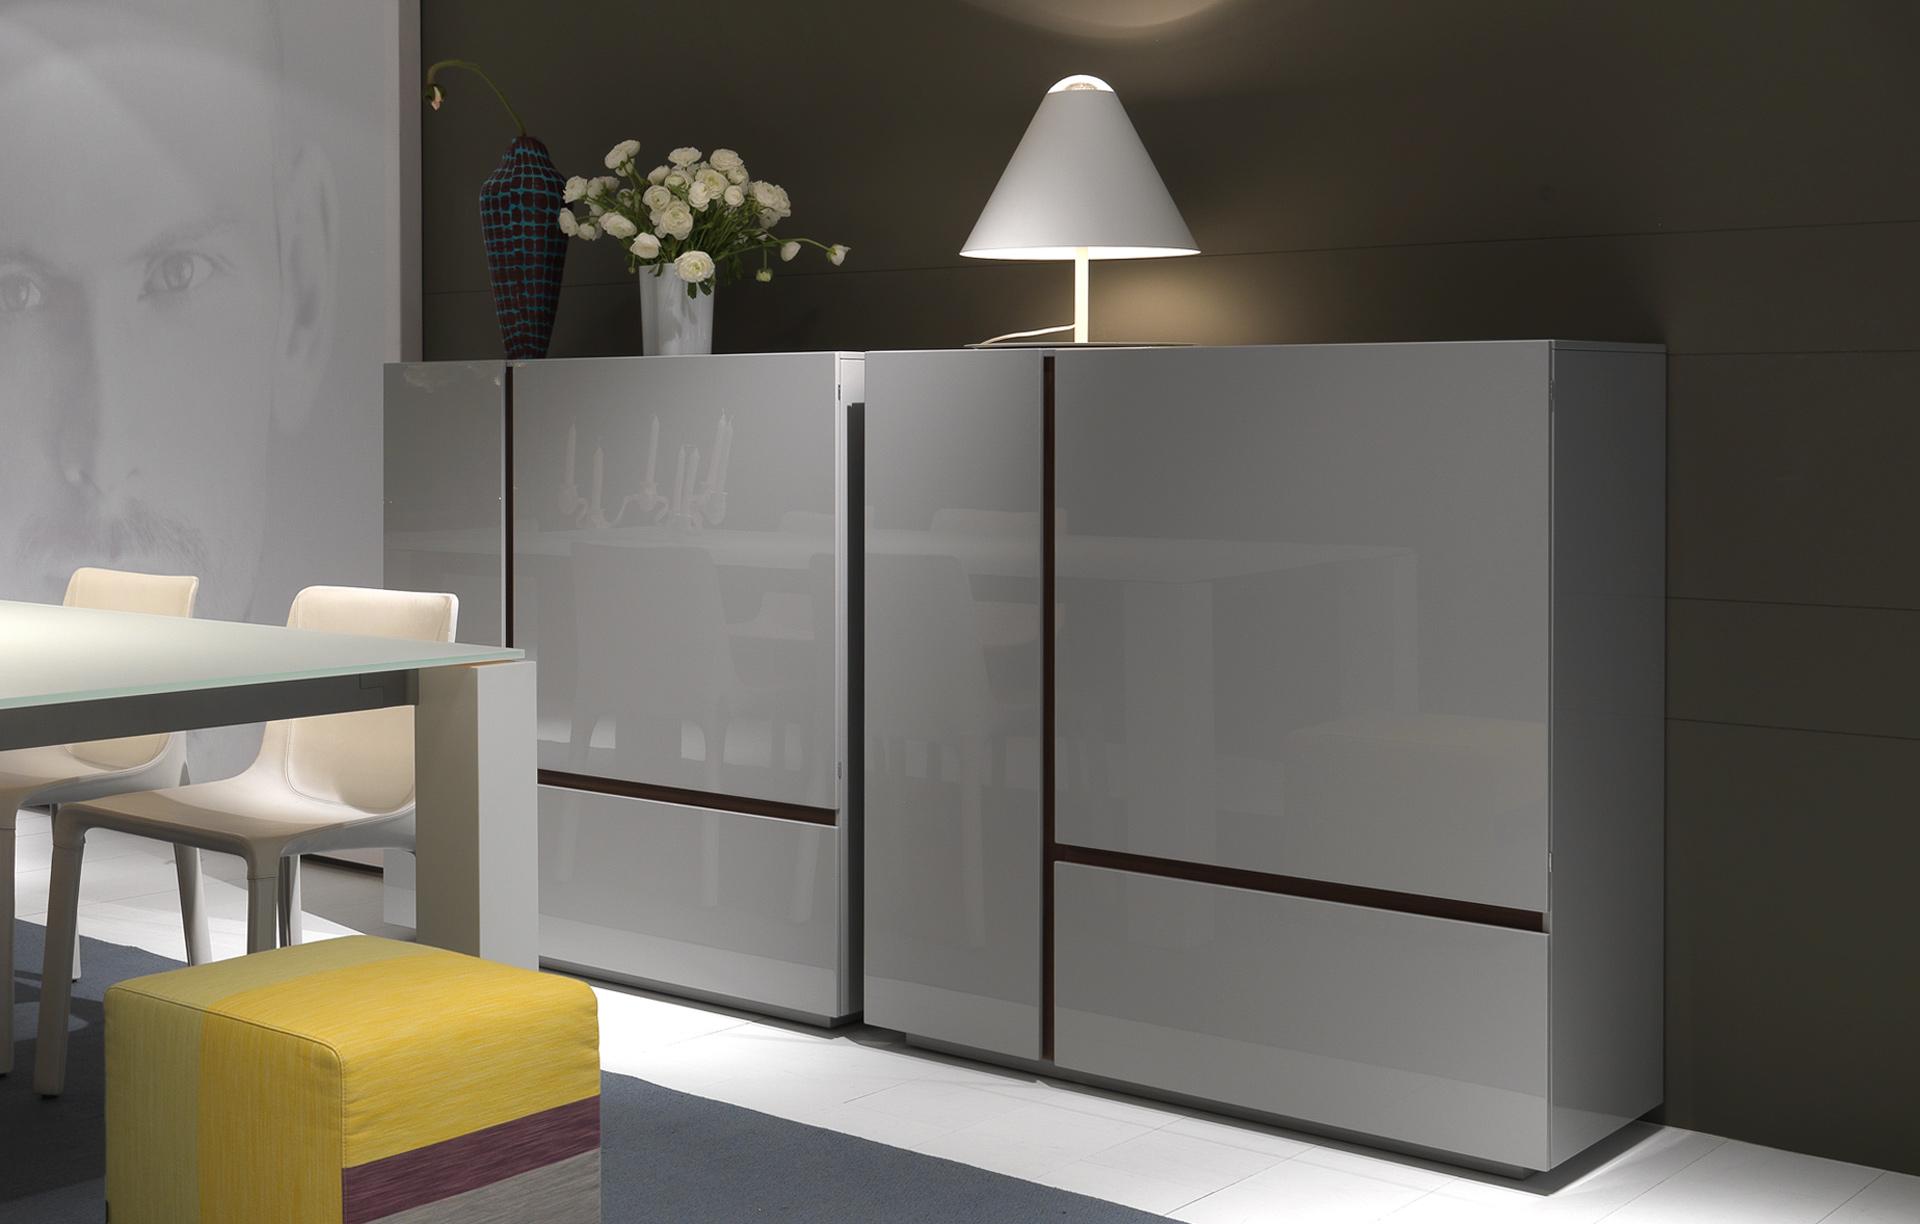 Credenza Moderna Grigia : Madia free poliform design carlo colombo arredamento &